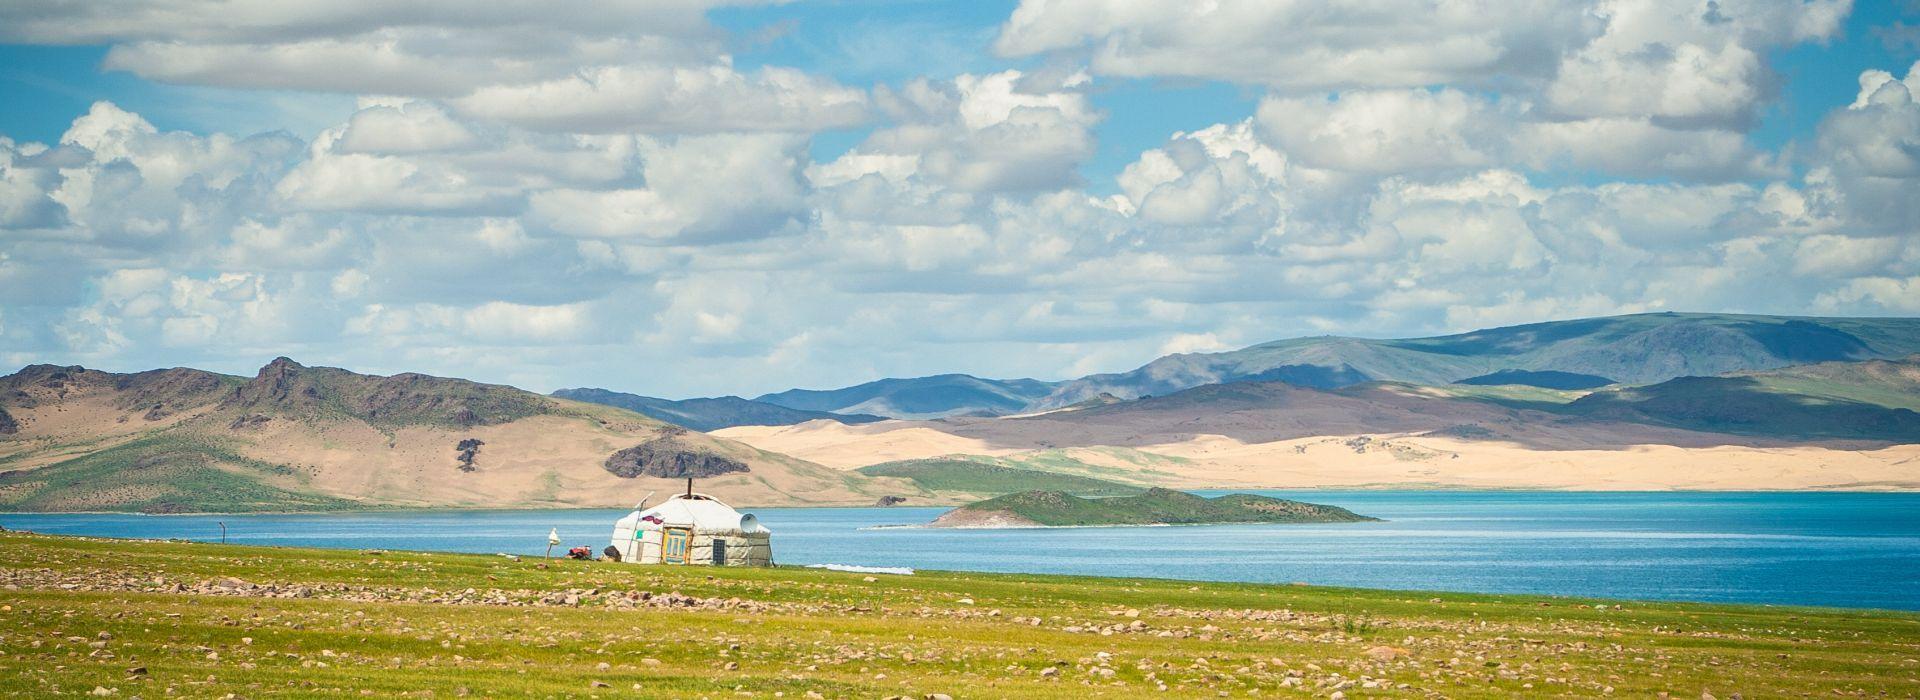 Adventure and sport Tours in Ulaanbaatar